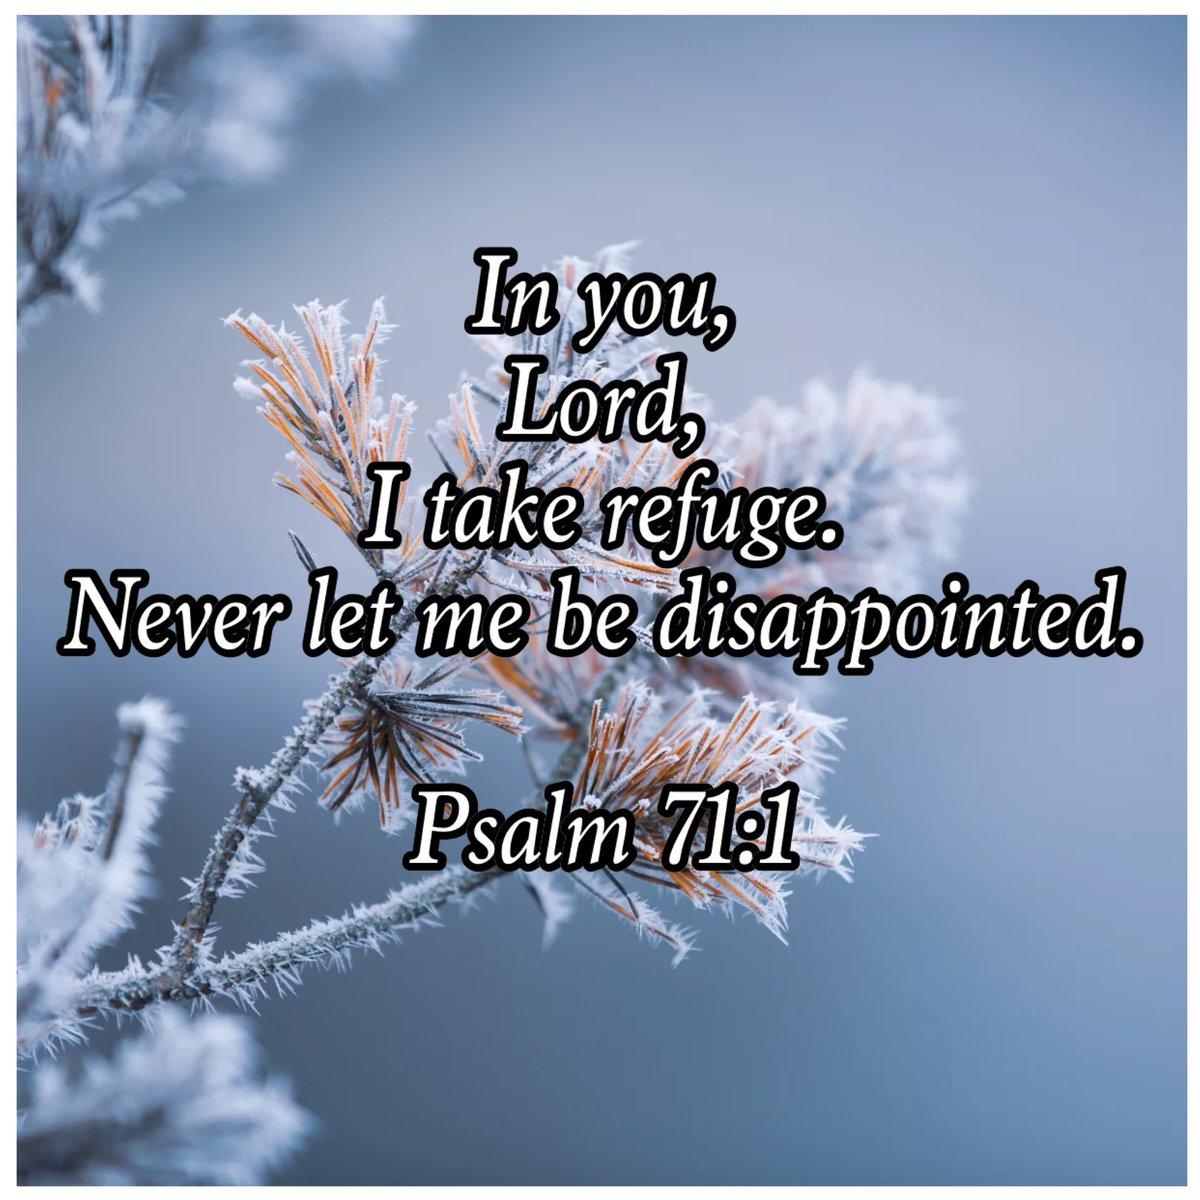 Bible Verse Of The Day #dailyverse #bible #bibleverse #Christ #Jesus #God #Lord  #SundayVerse #january #church #newyear #2021